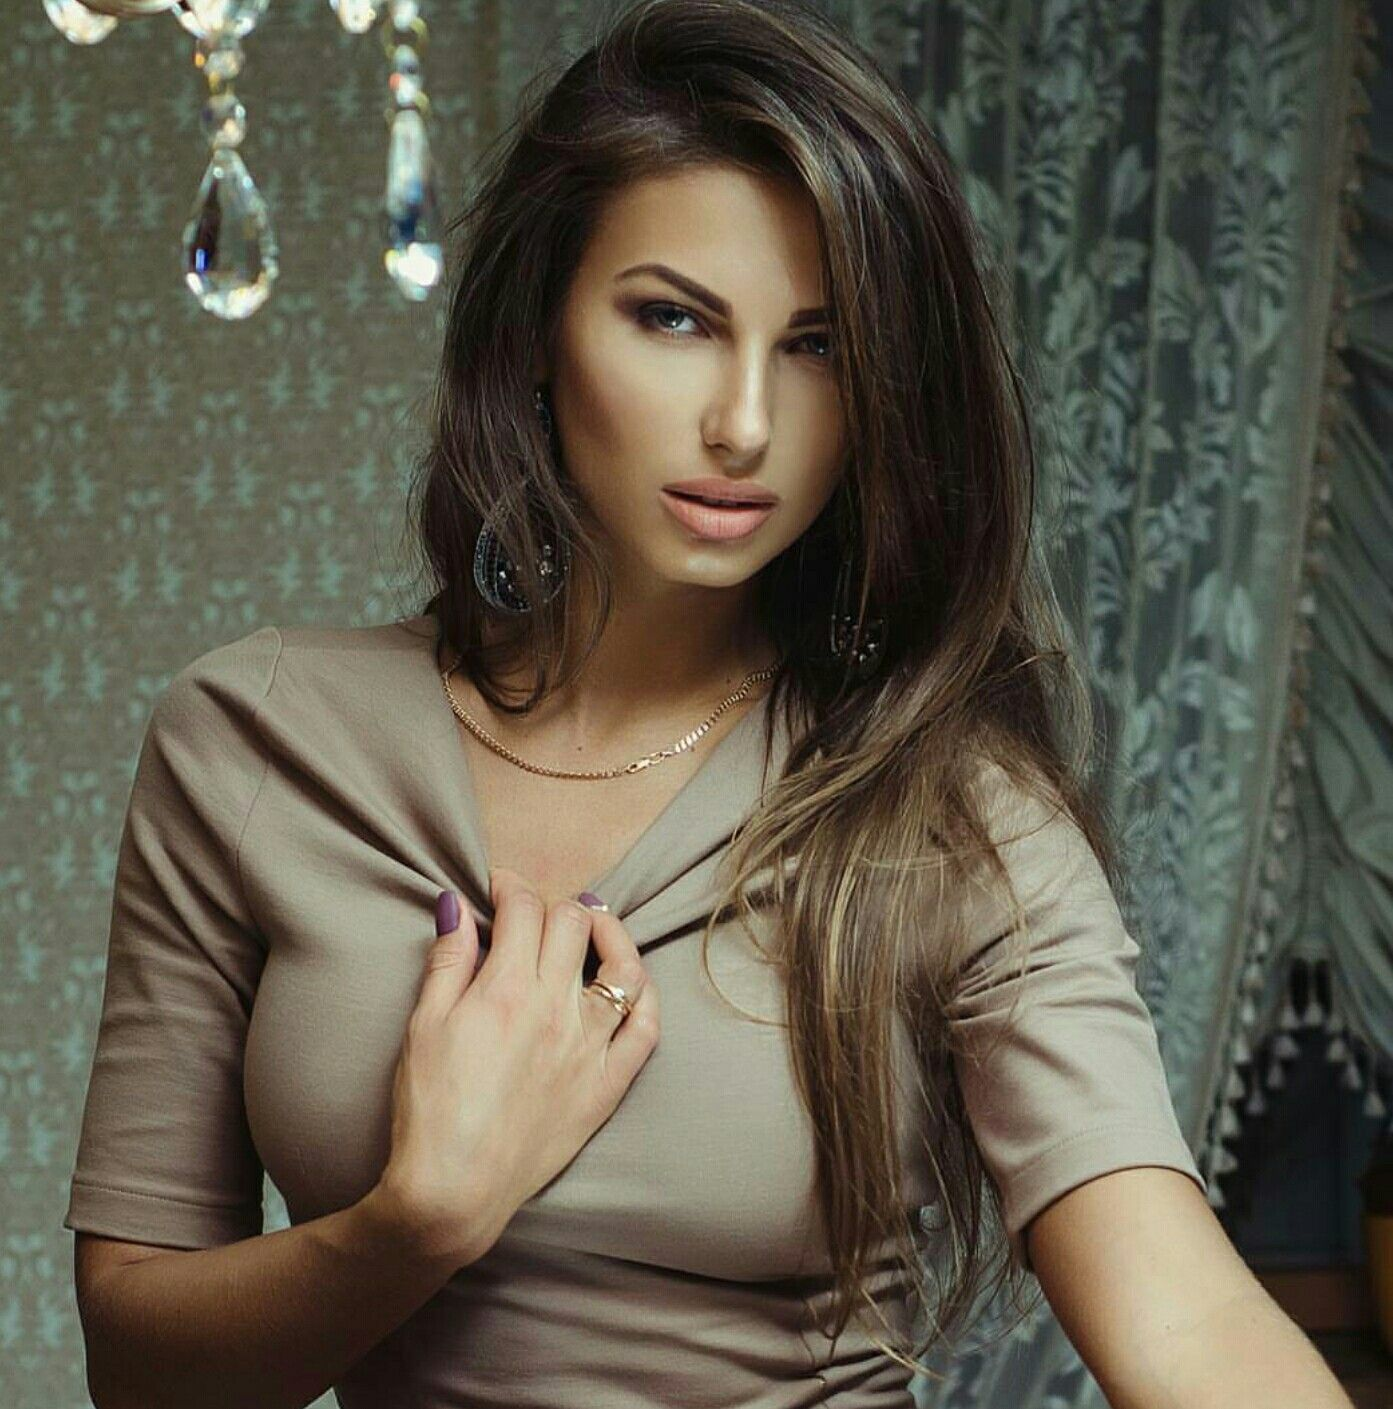 Mathilda May Pussy Beautiful pinkatvis leader on daria shy | pinterest | models